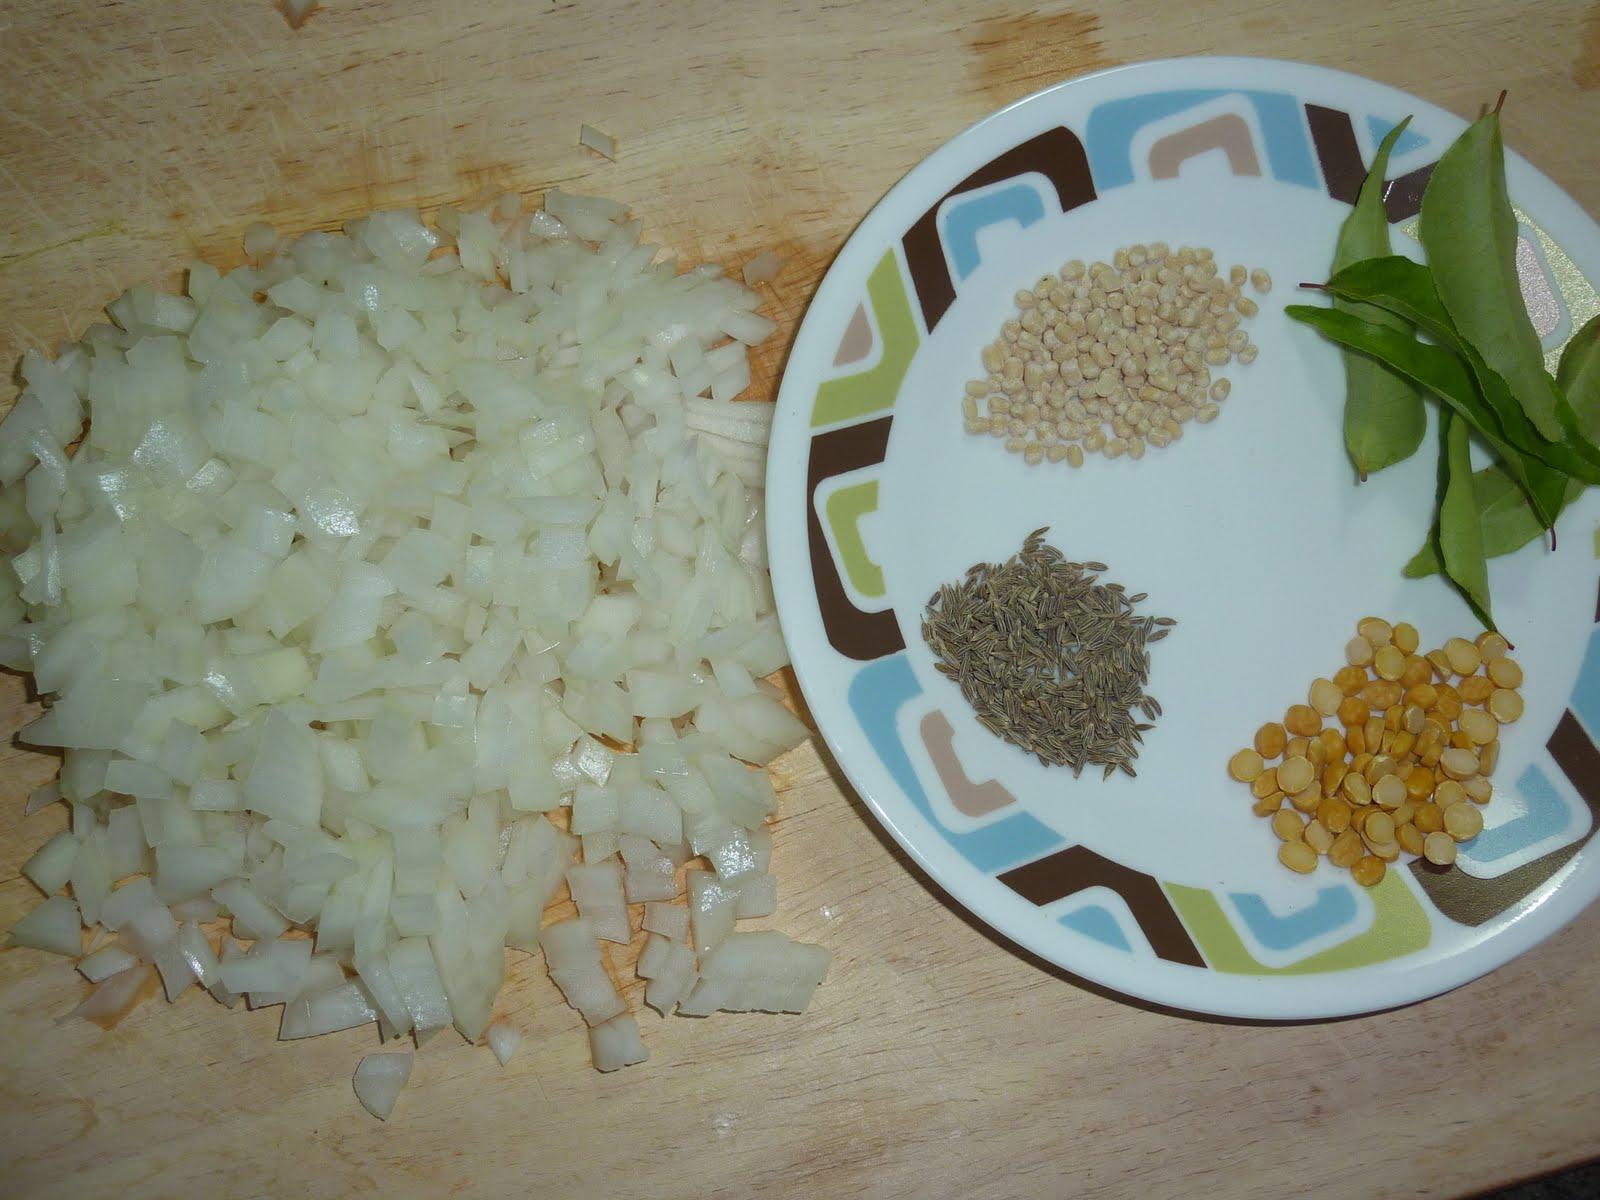 Aaha Oho: Vangi(Brinjal) Quinoa